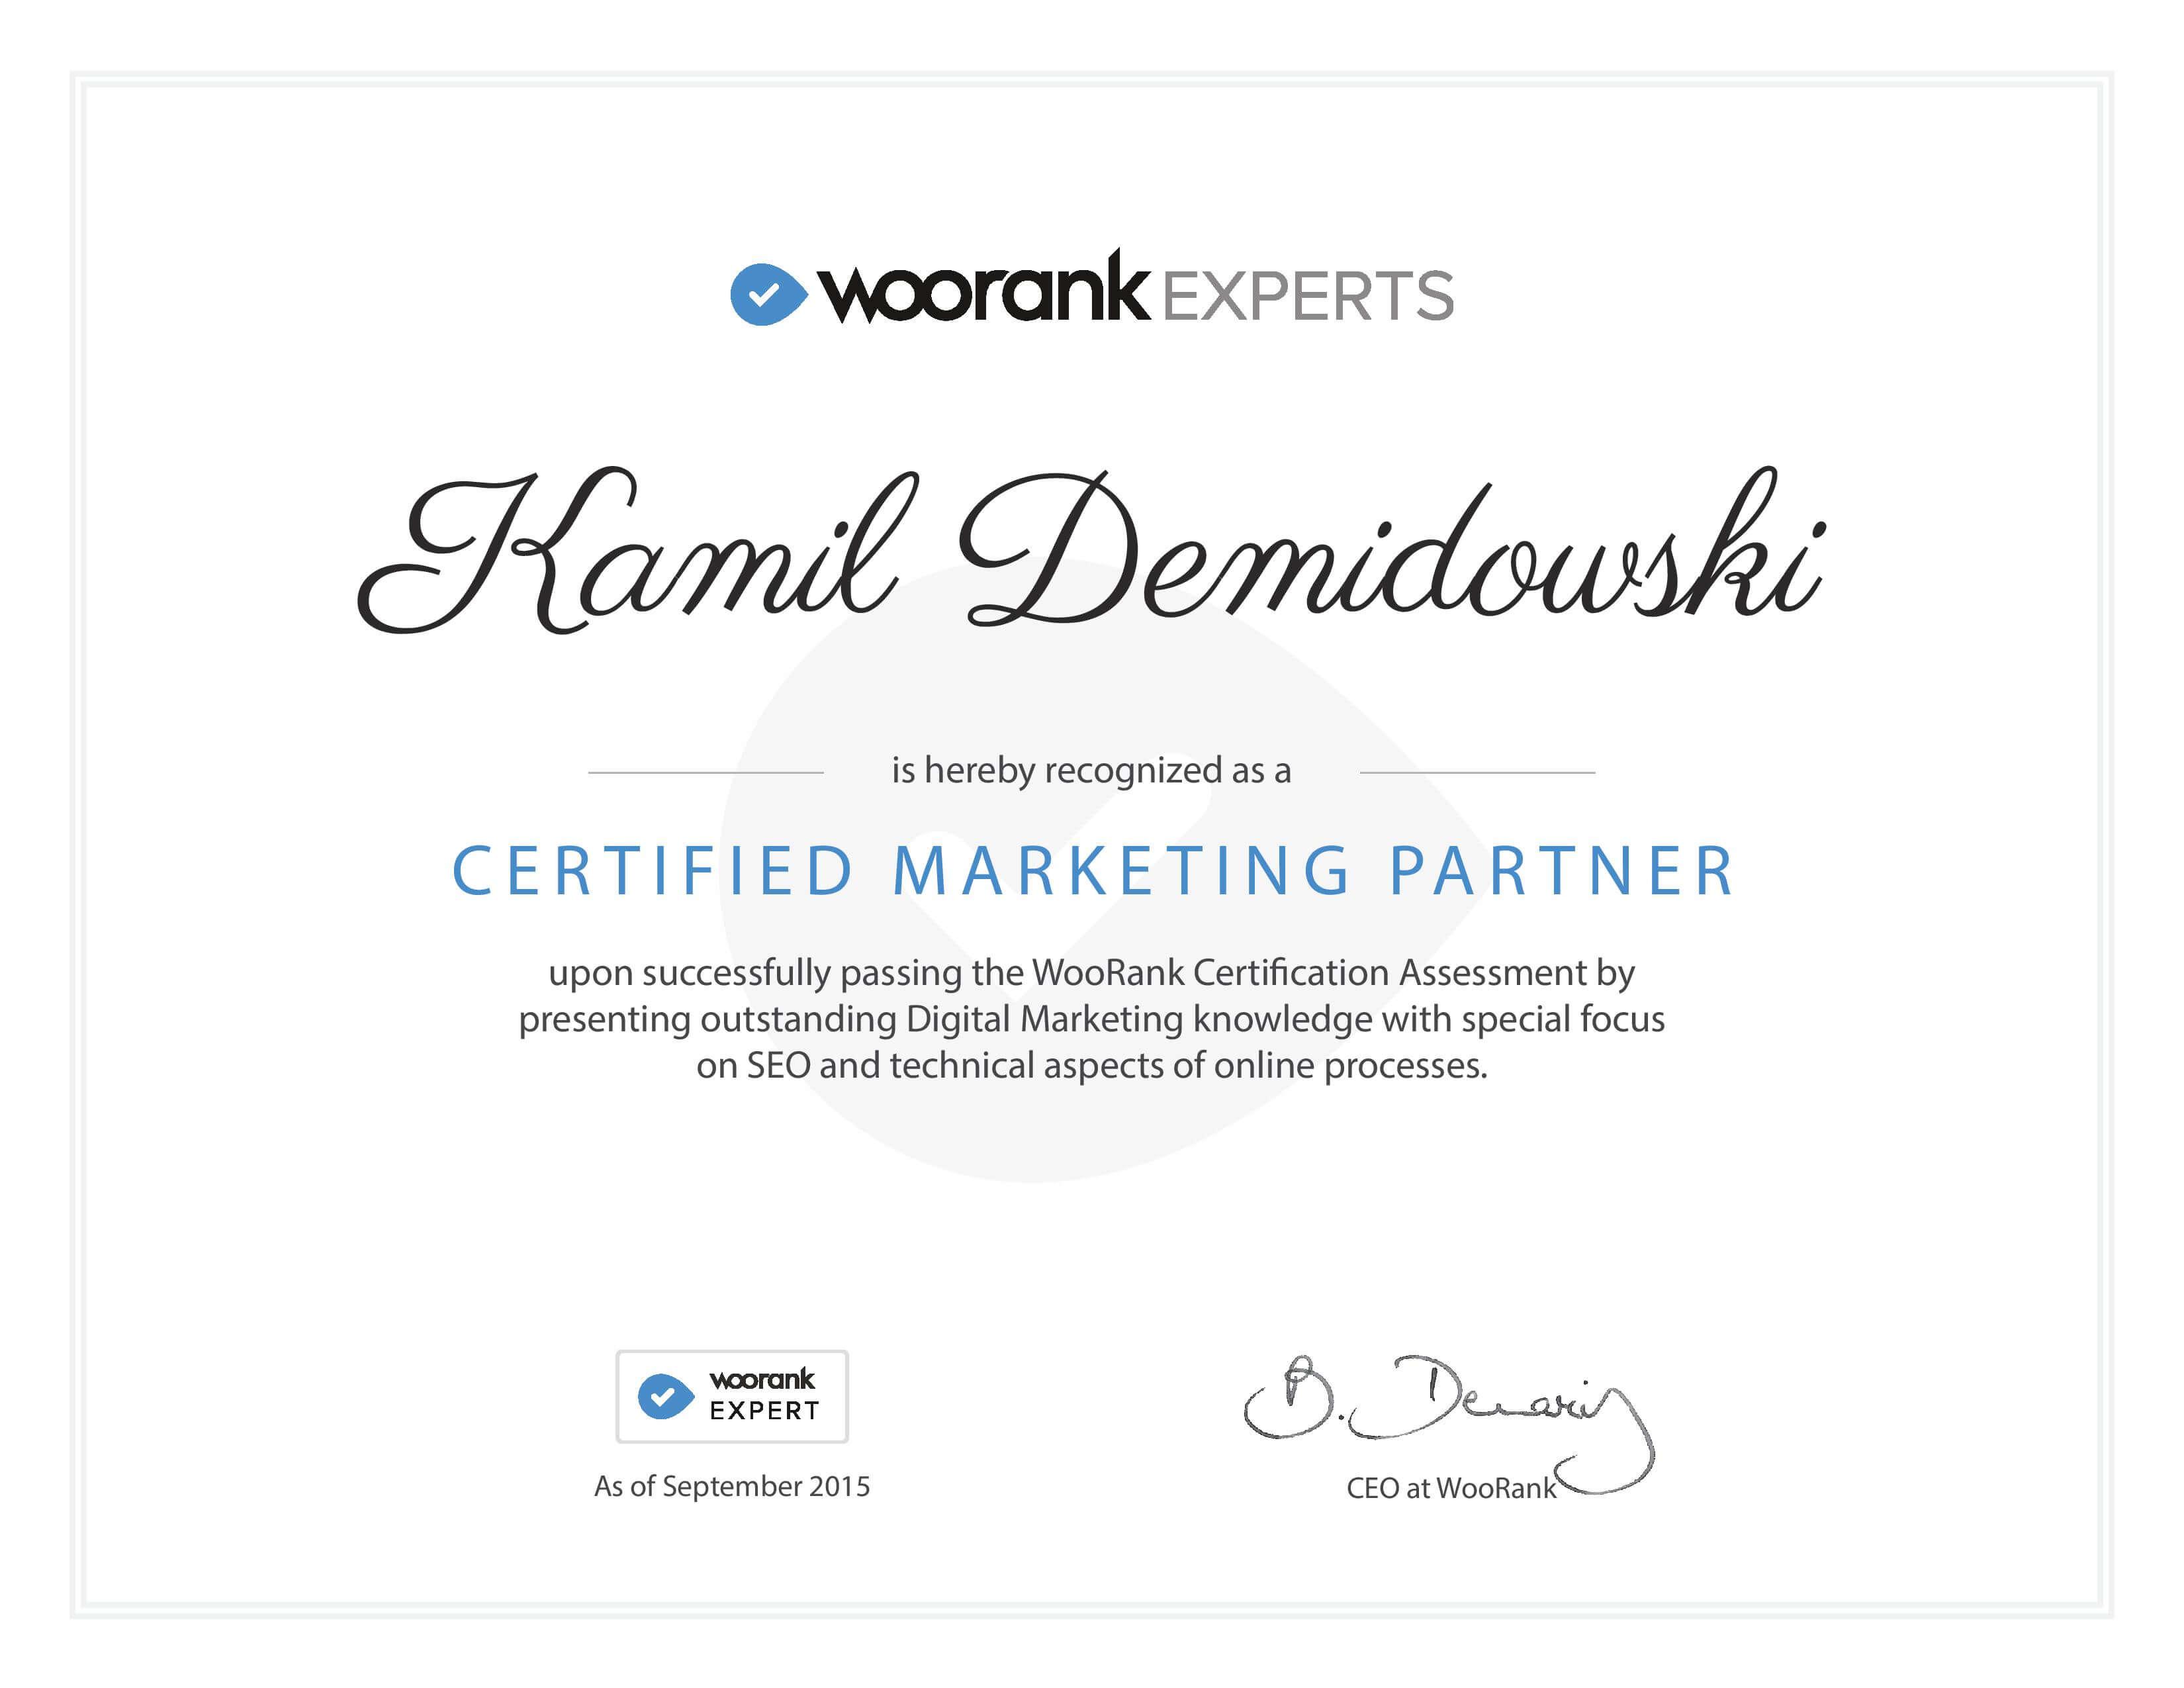 kamil-demidowski-woorank-expert